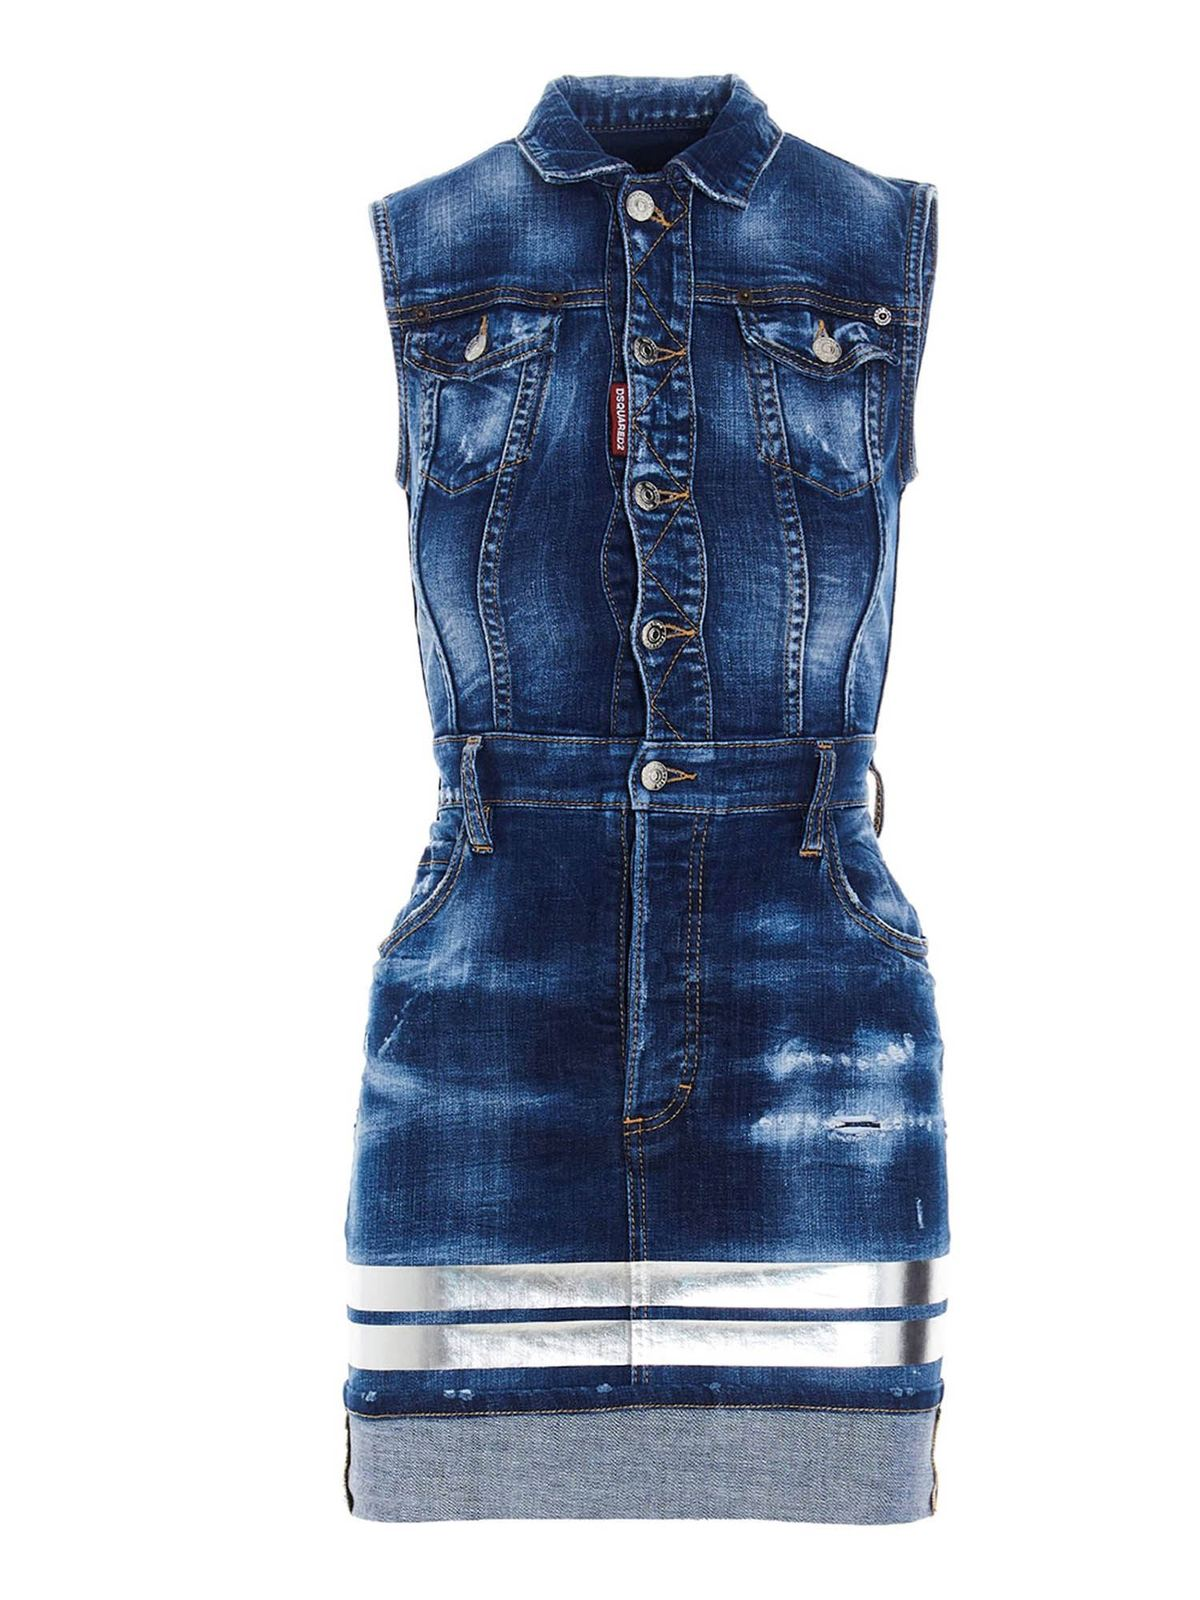 Dsquared2 SLEEVELESS DENIM SHEATH DRESS IN BLUE